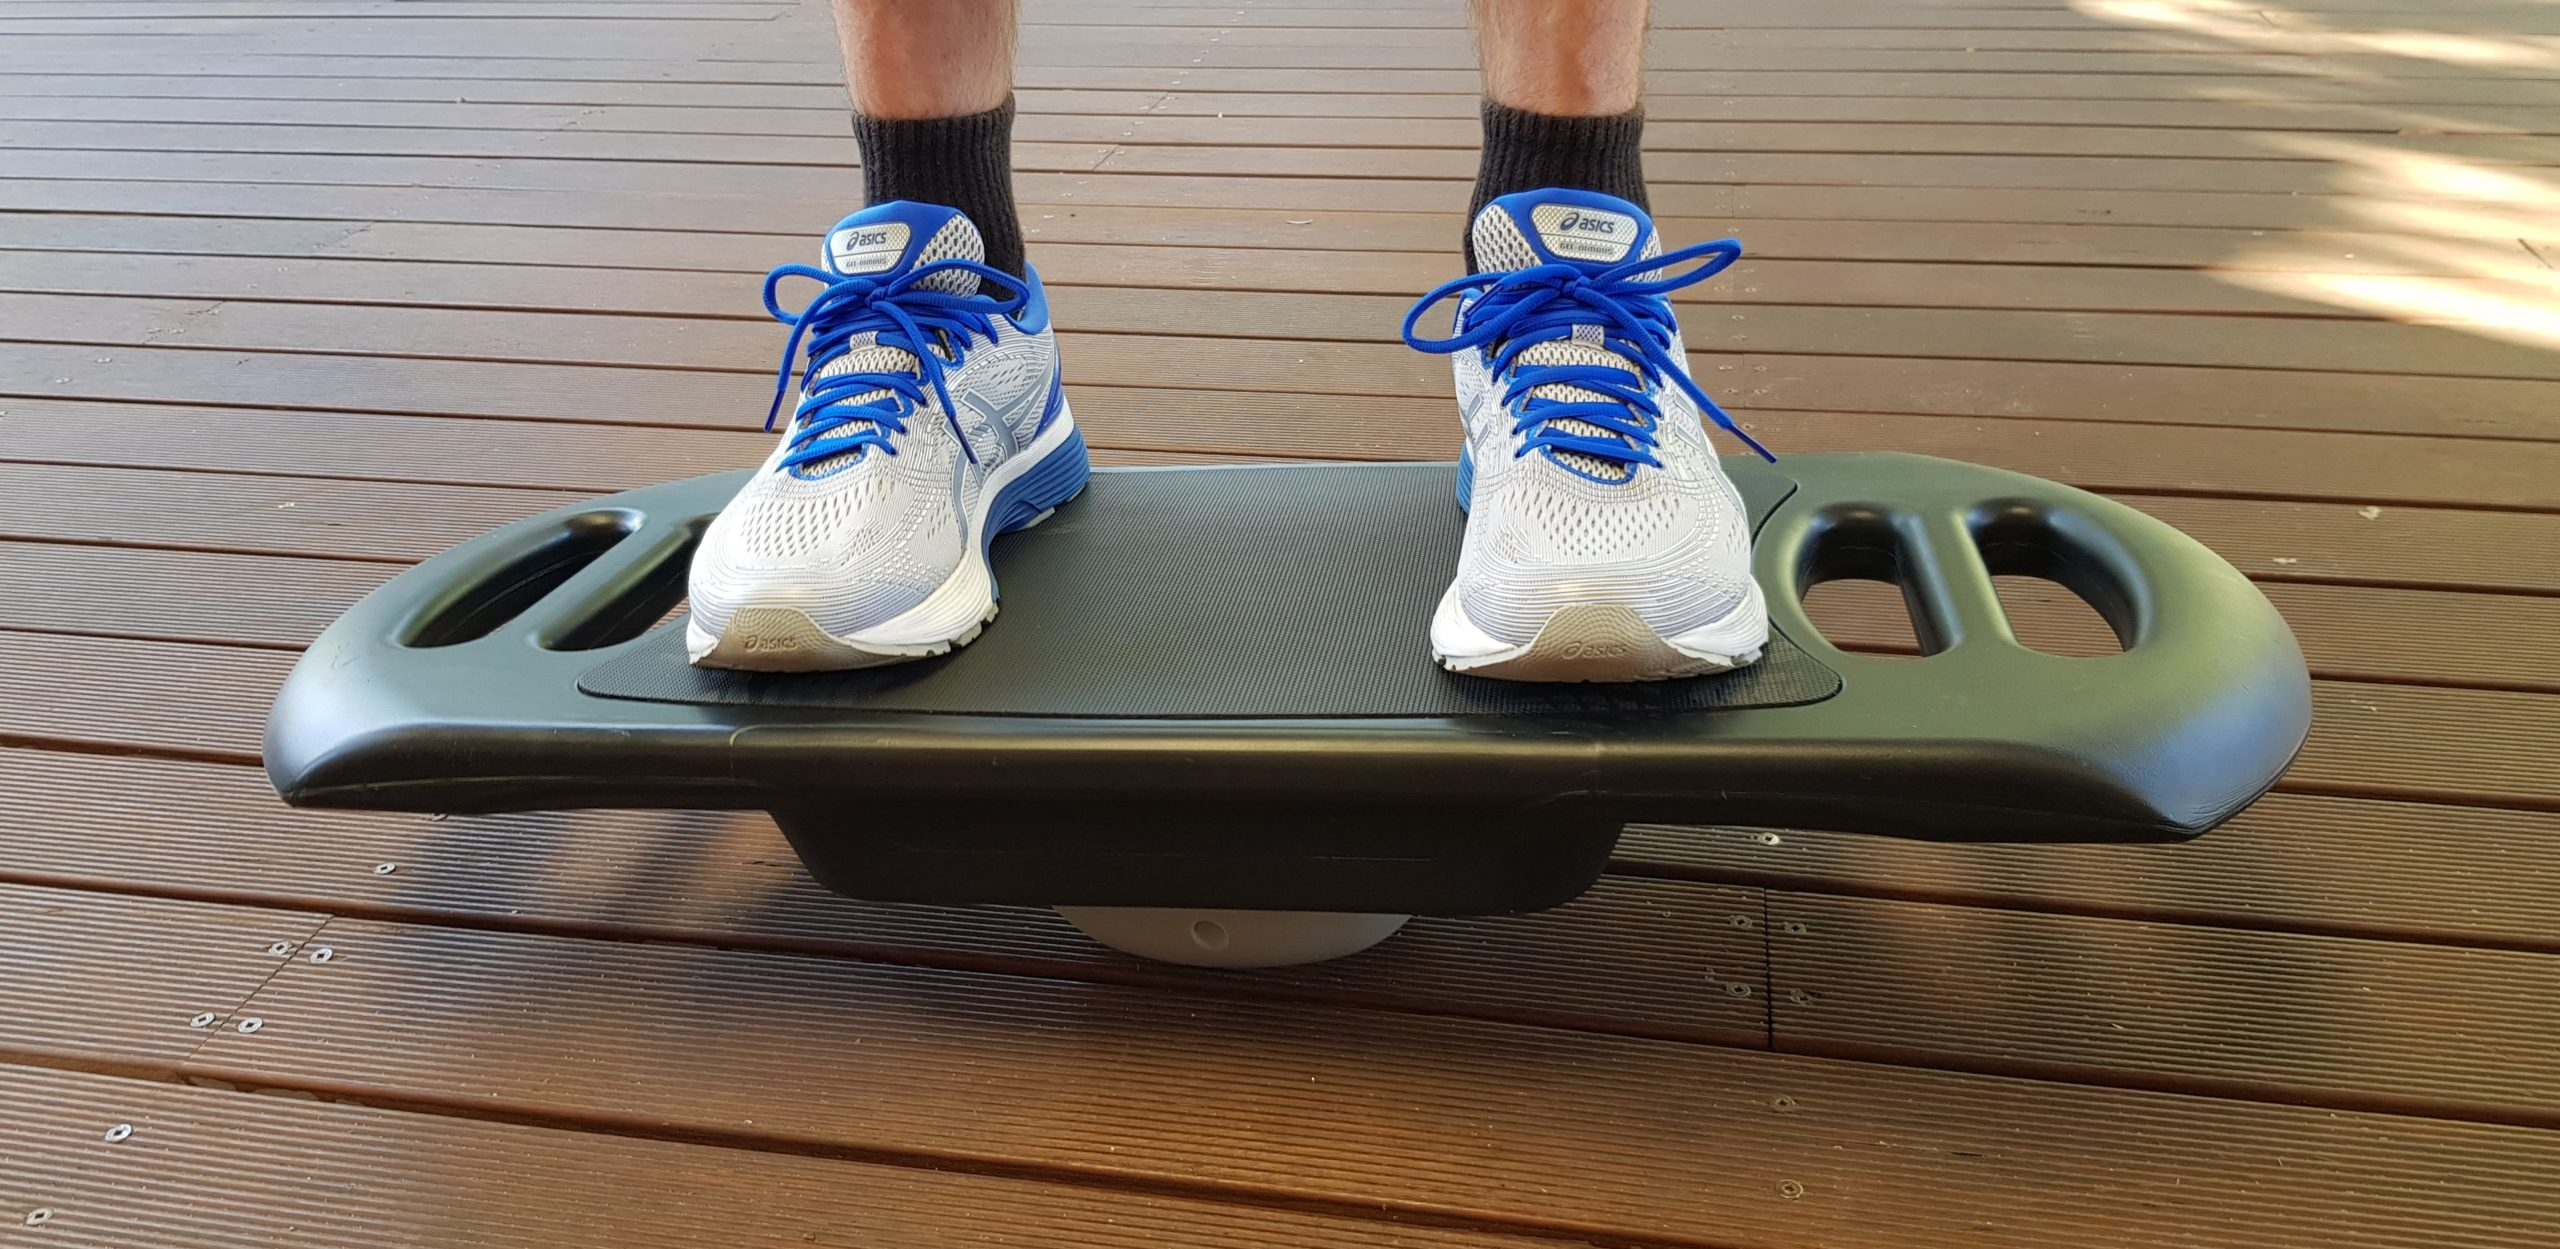 Your Home Physio Balance Board Photo